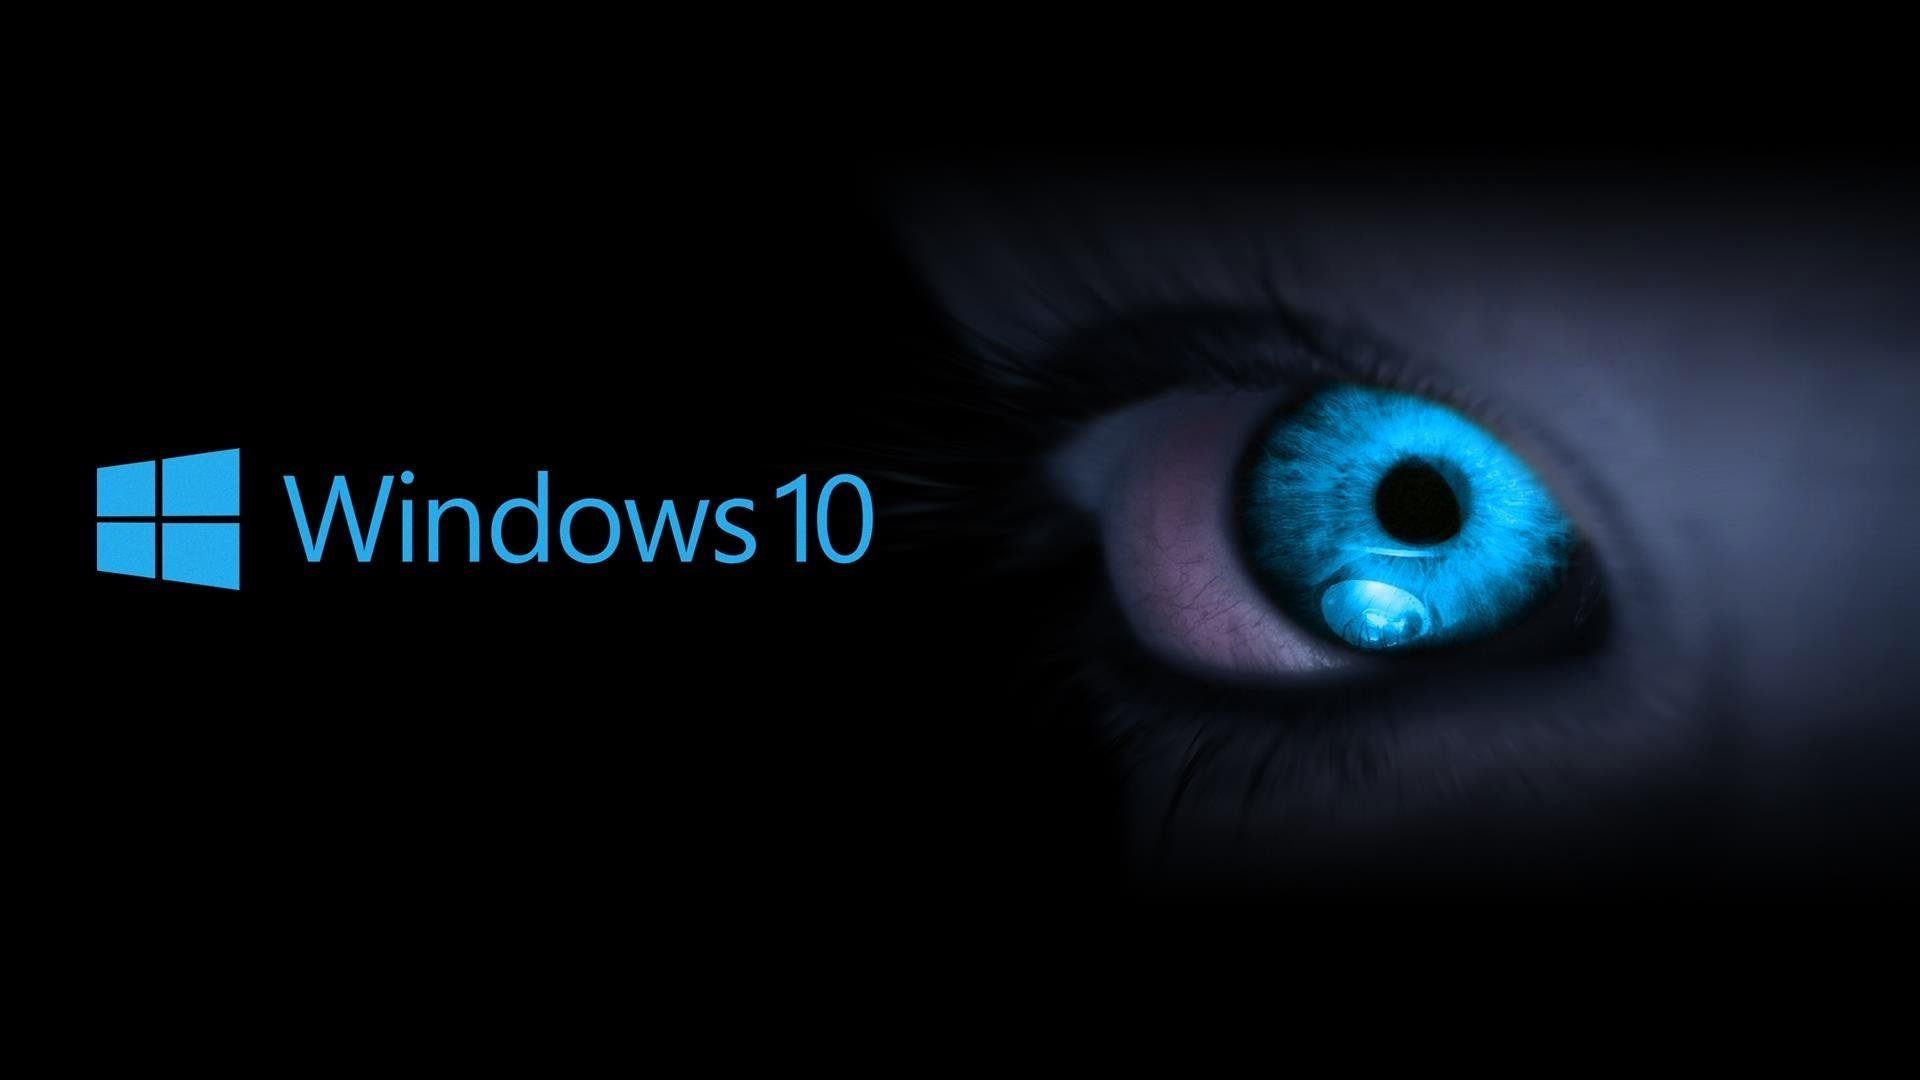 Windows 10 Wallpaper Hd 3d Wallpapers Wide for HD Wallpaper Desktop  px 47.62 KB